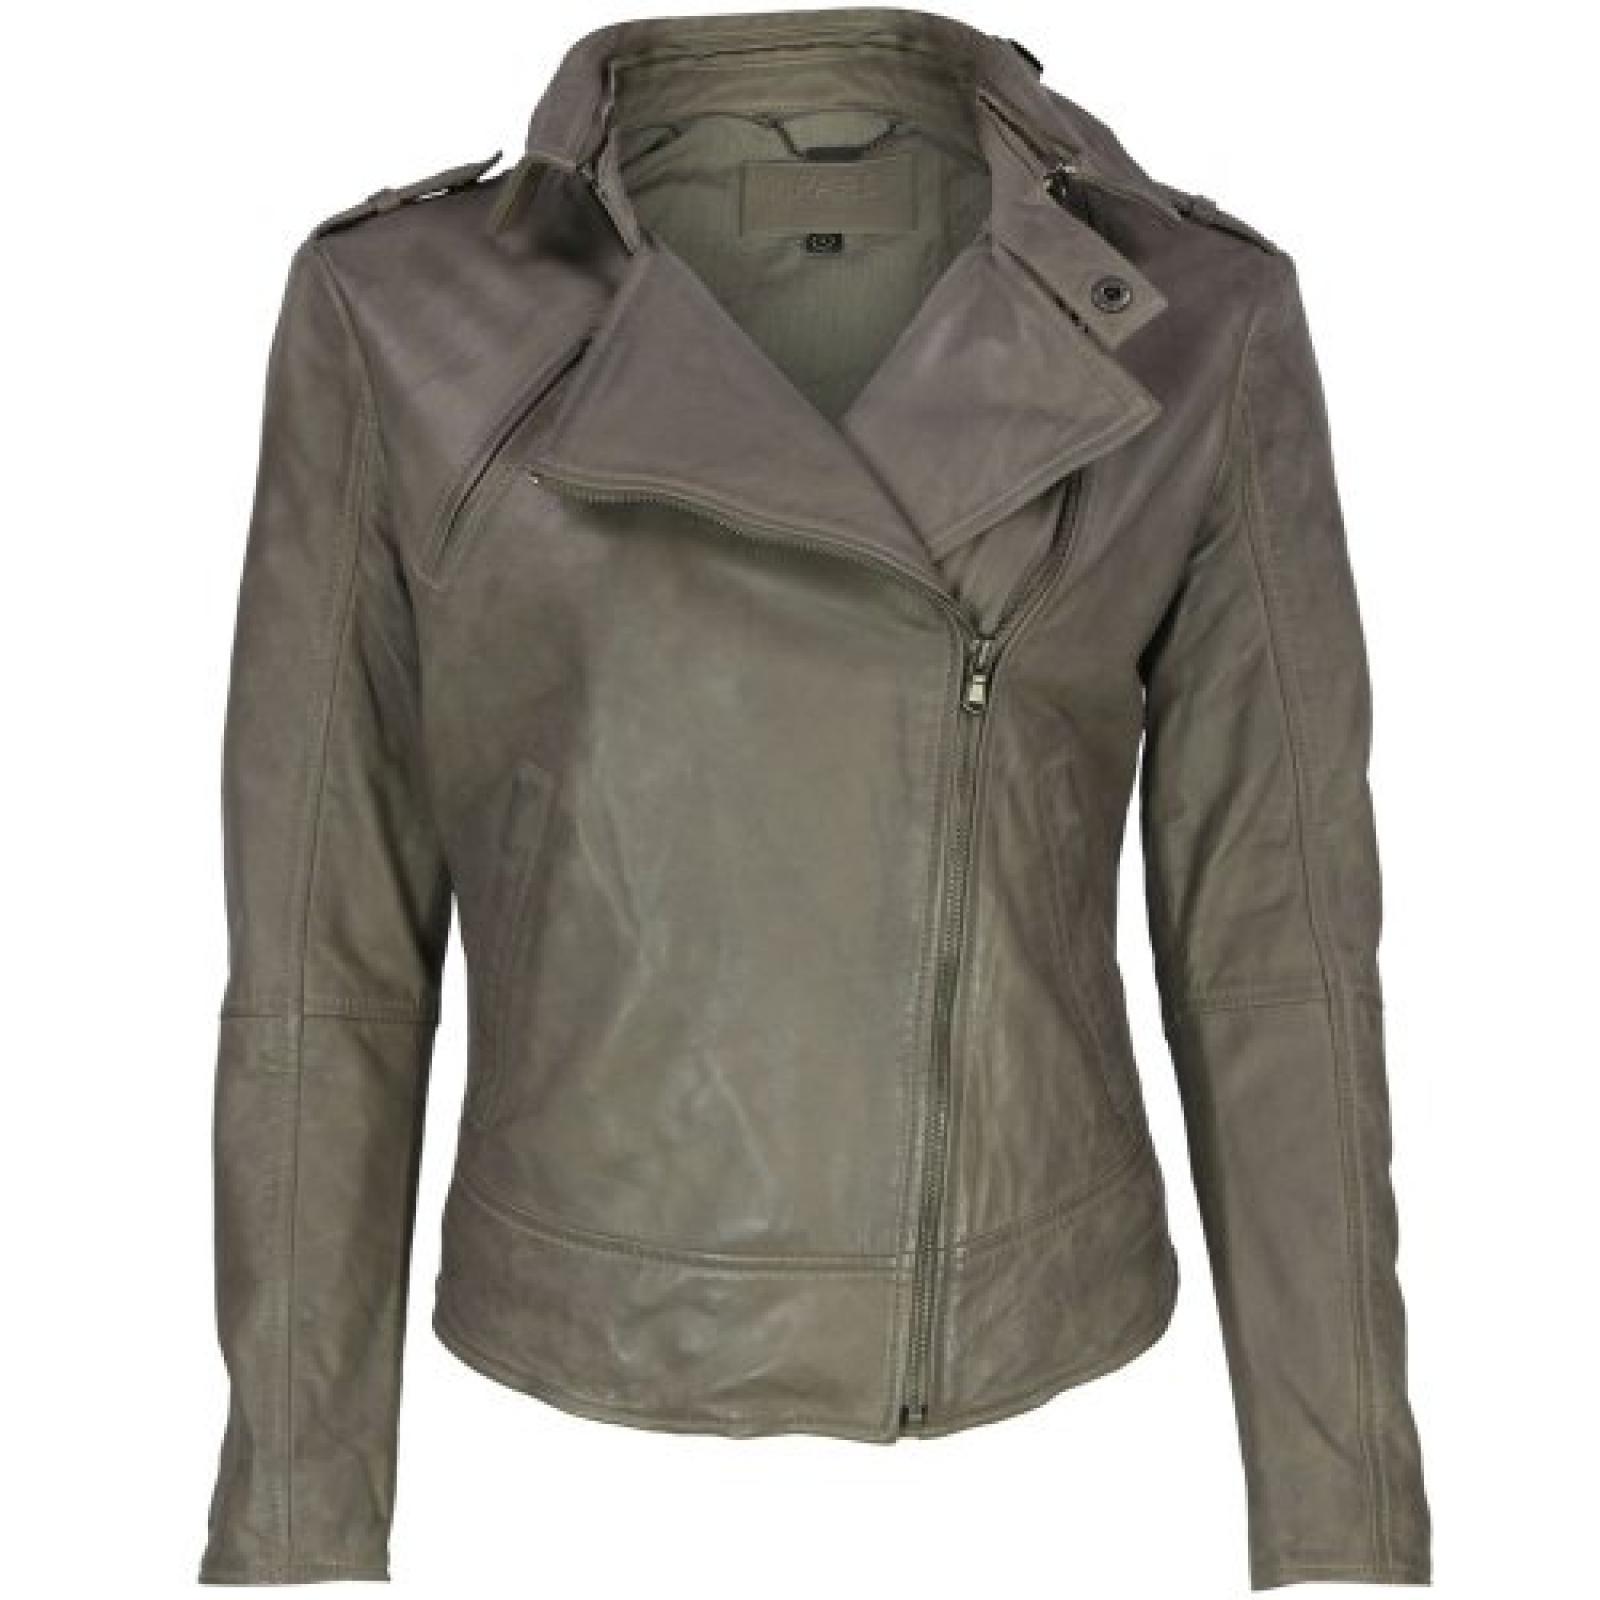 VIPARO Khaki Aymmetrical Biker Leather Jacket - August